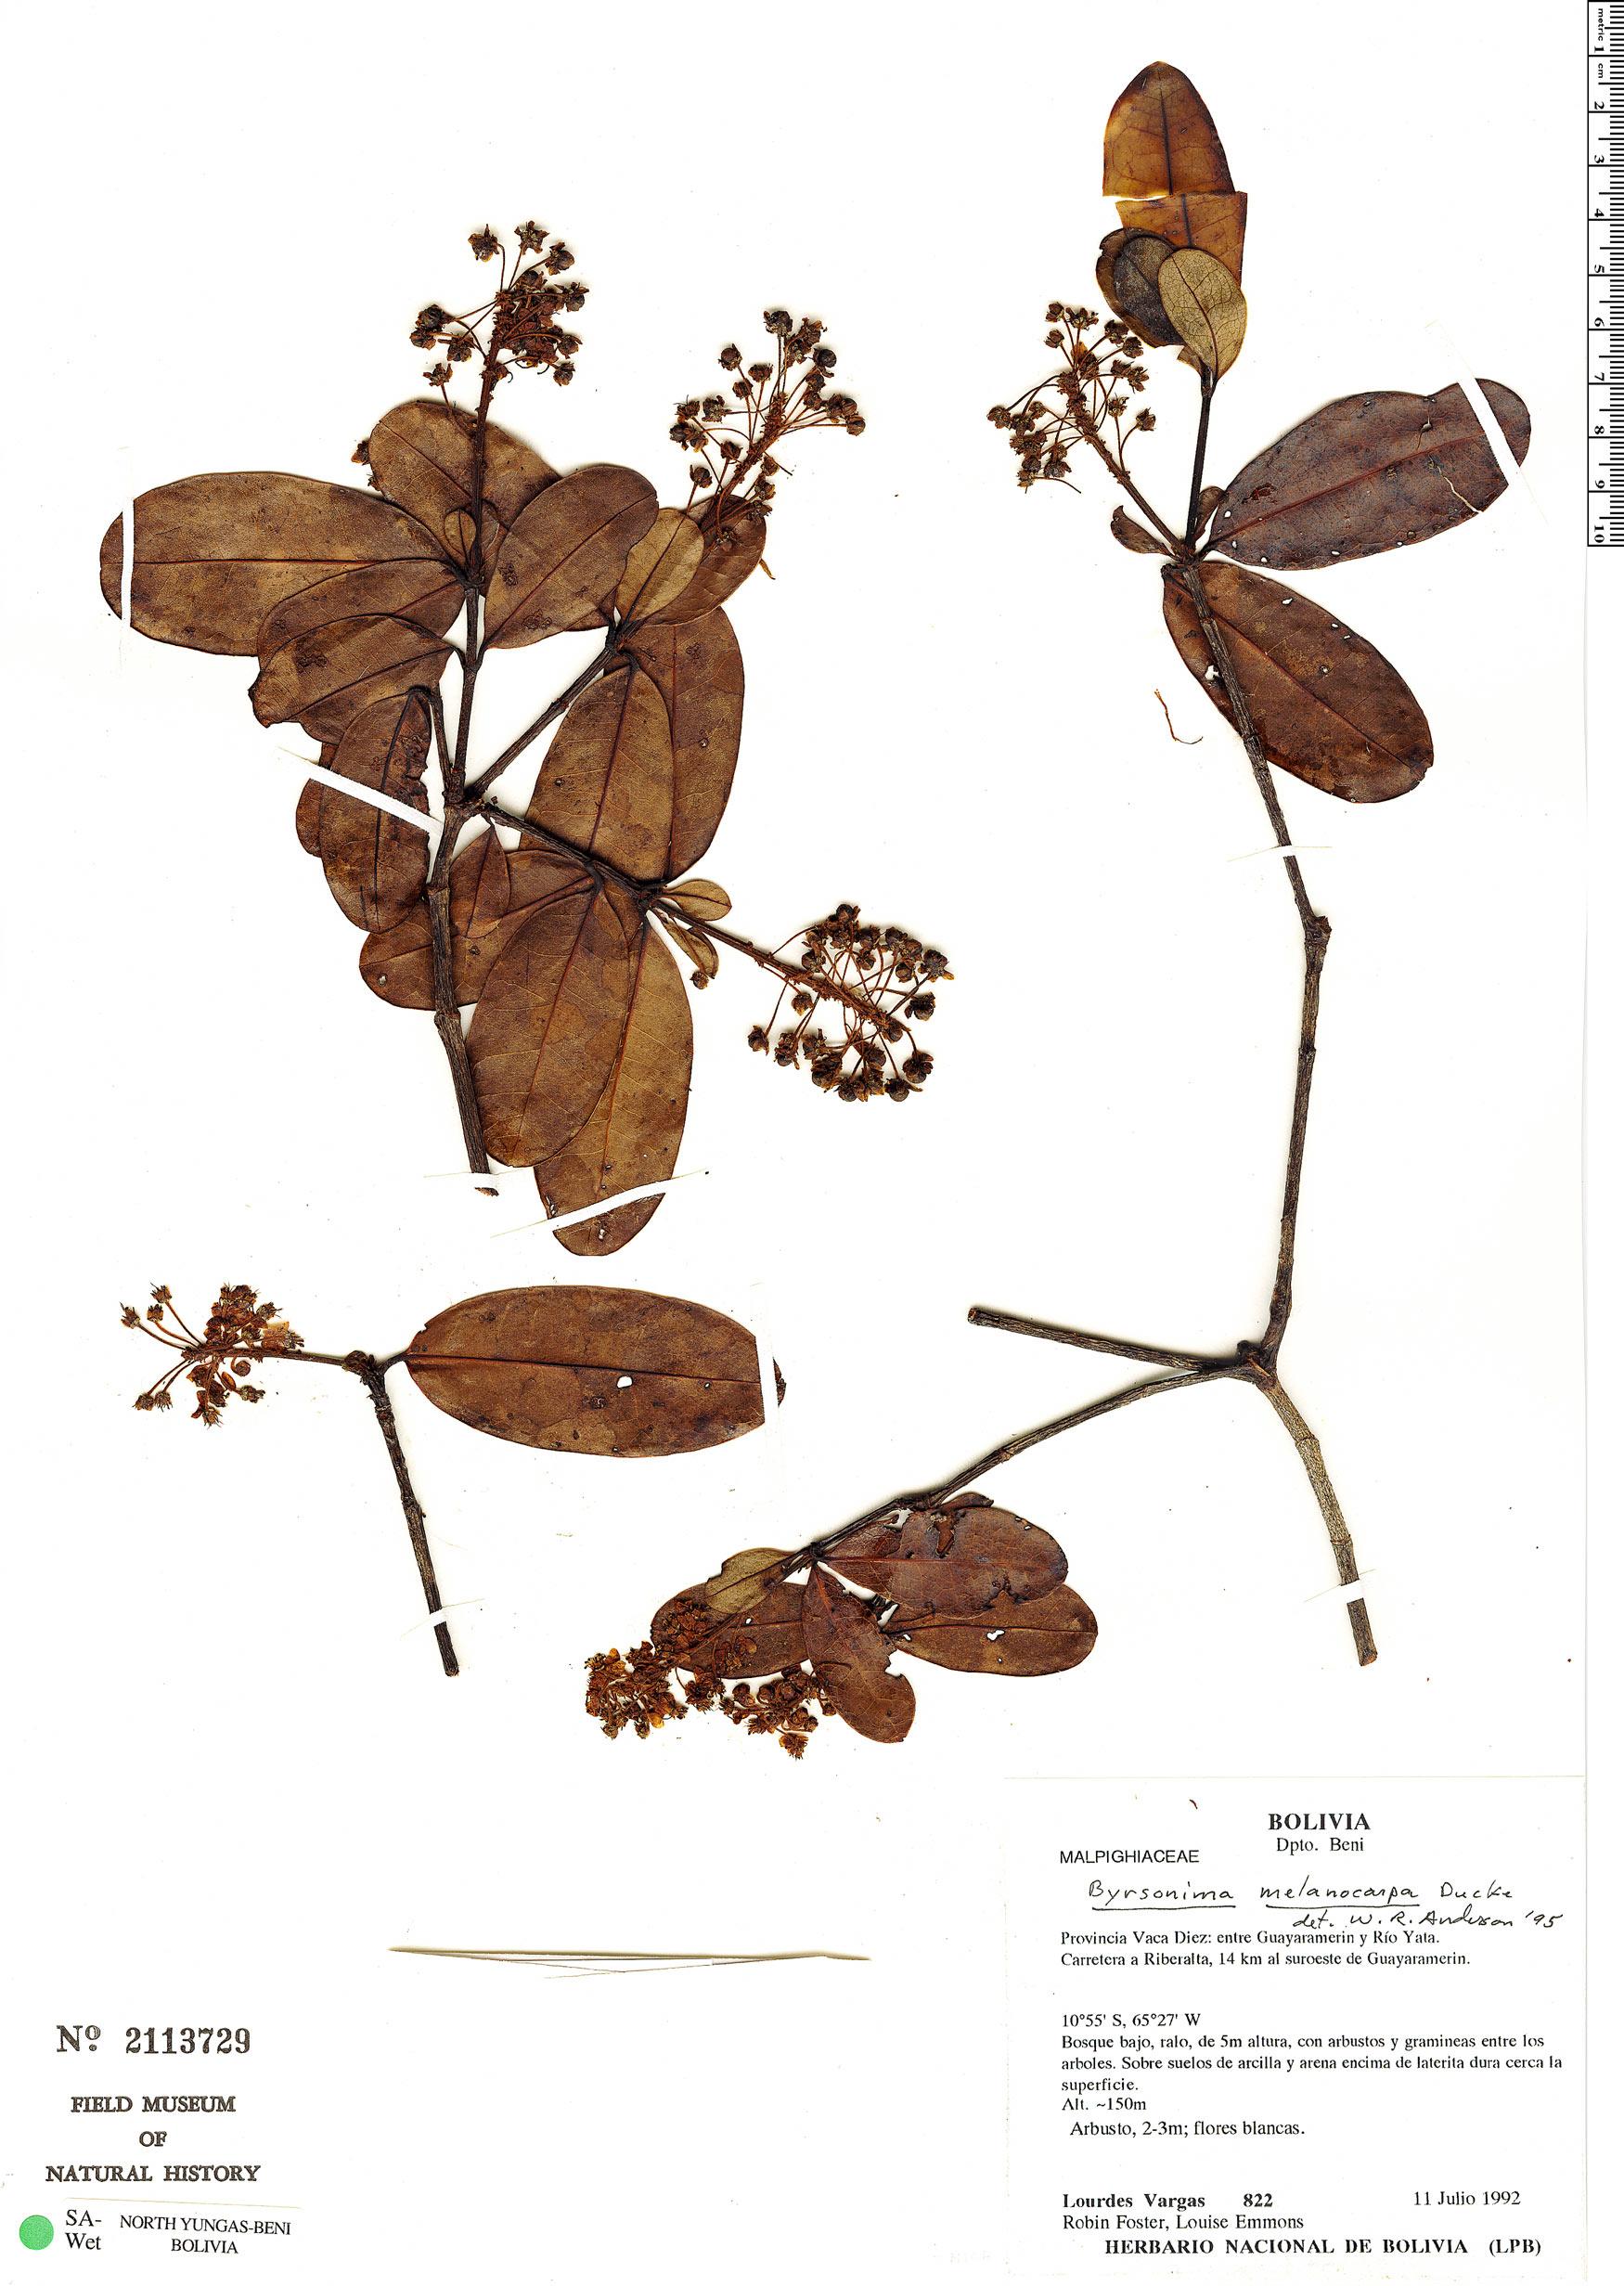 Espécimen: Byrsonima melanocarpa